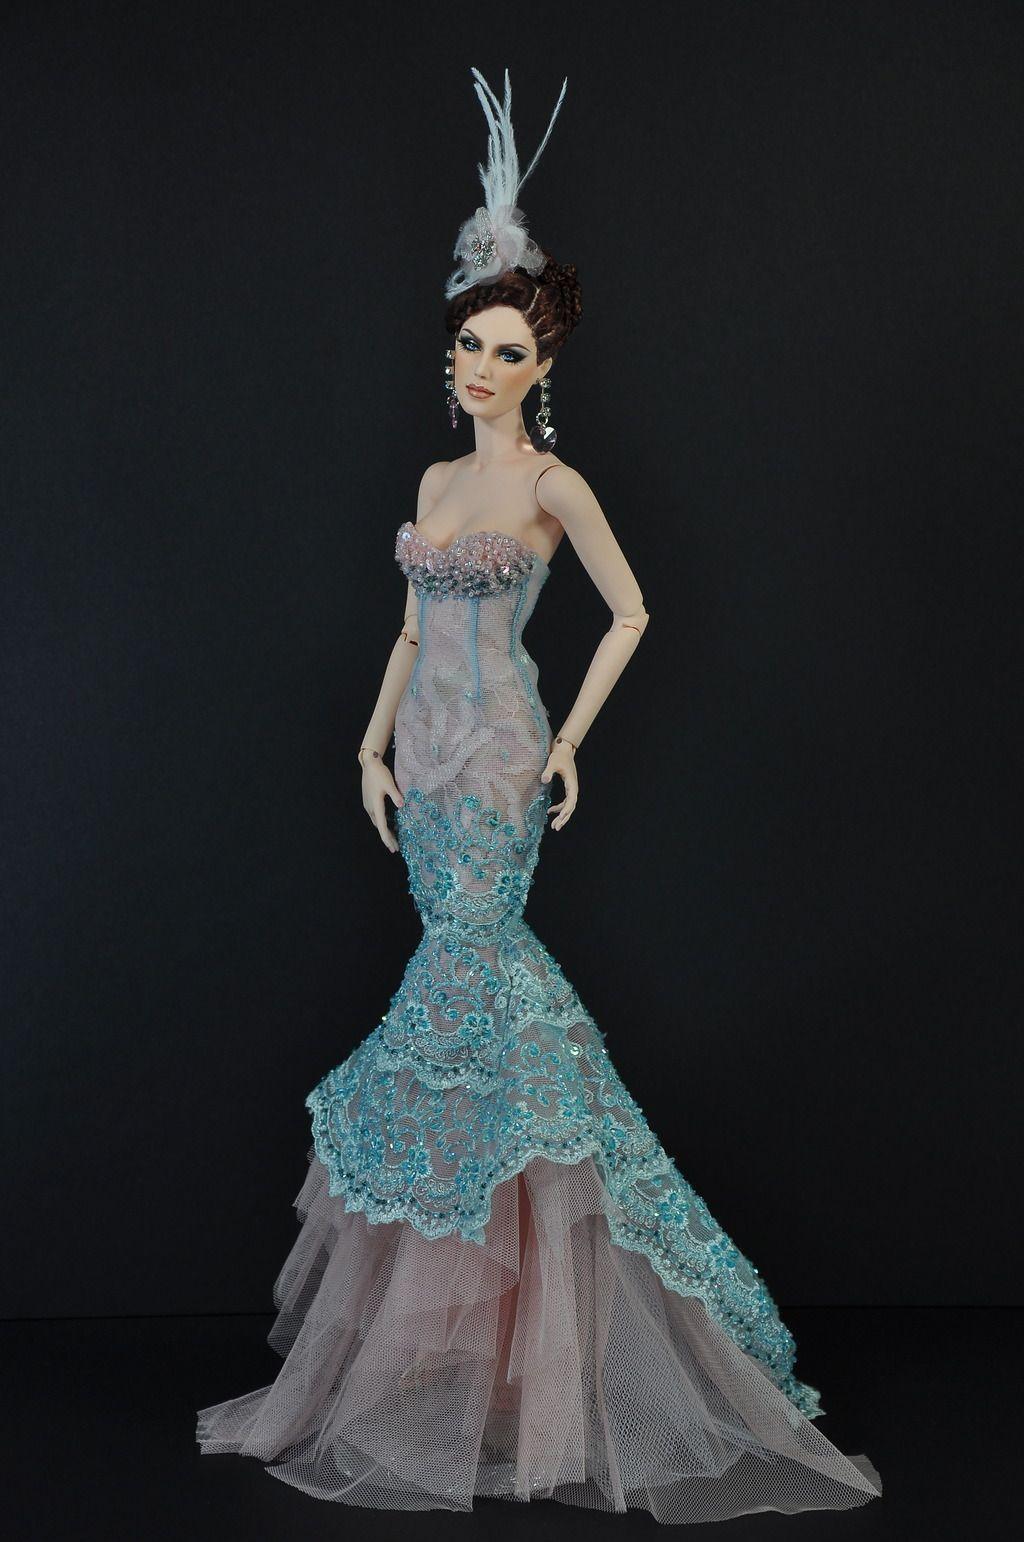 photo DSC_0108_zps9id7kwym.jpg | DOLLS: Fashion Dolls | Pinterest ...